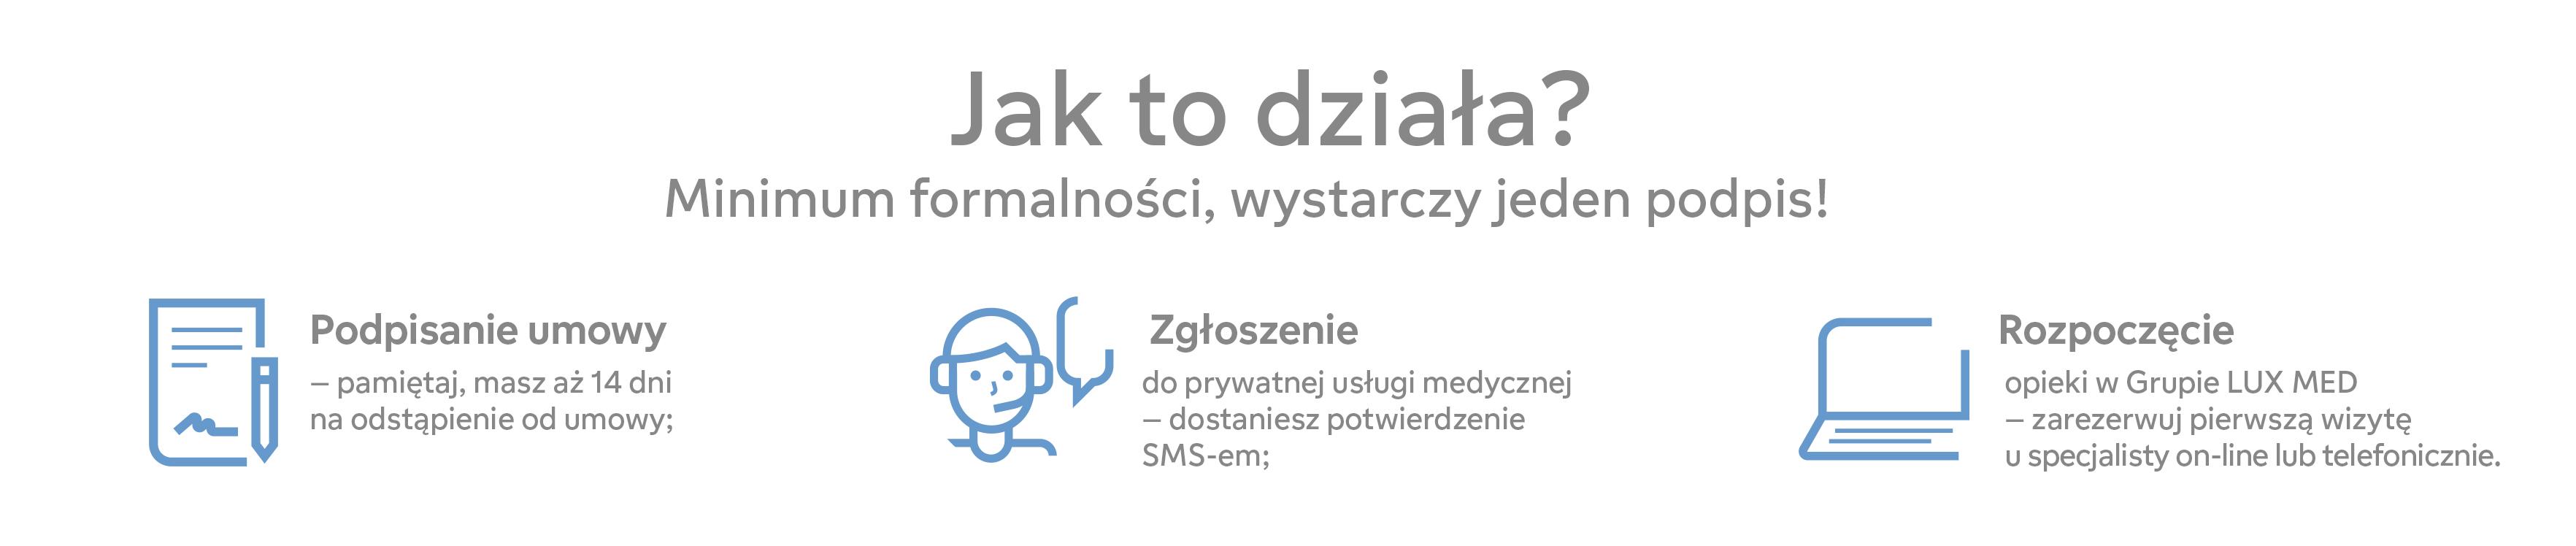 fortum_med_jak_to_dziala